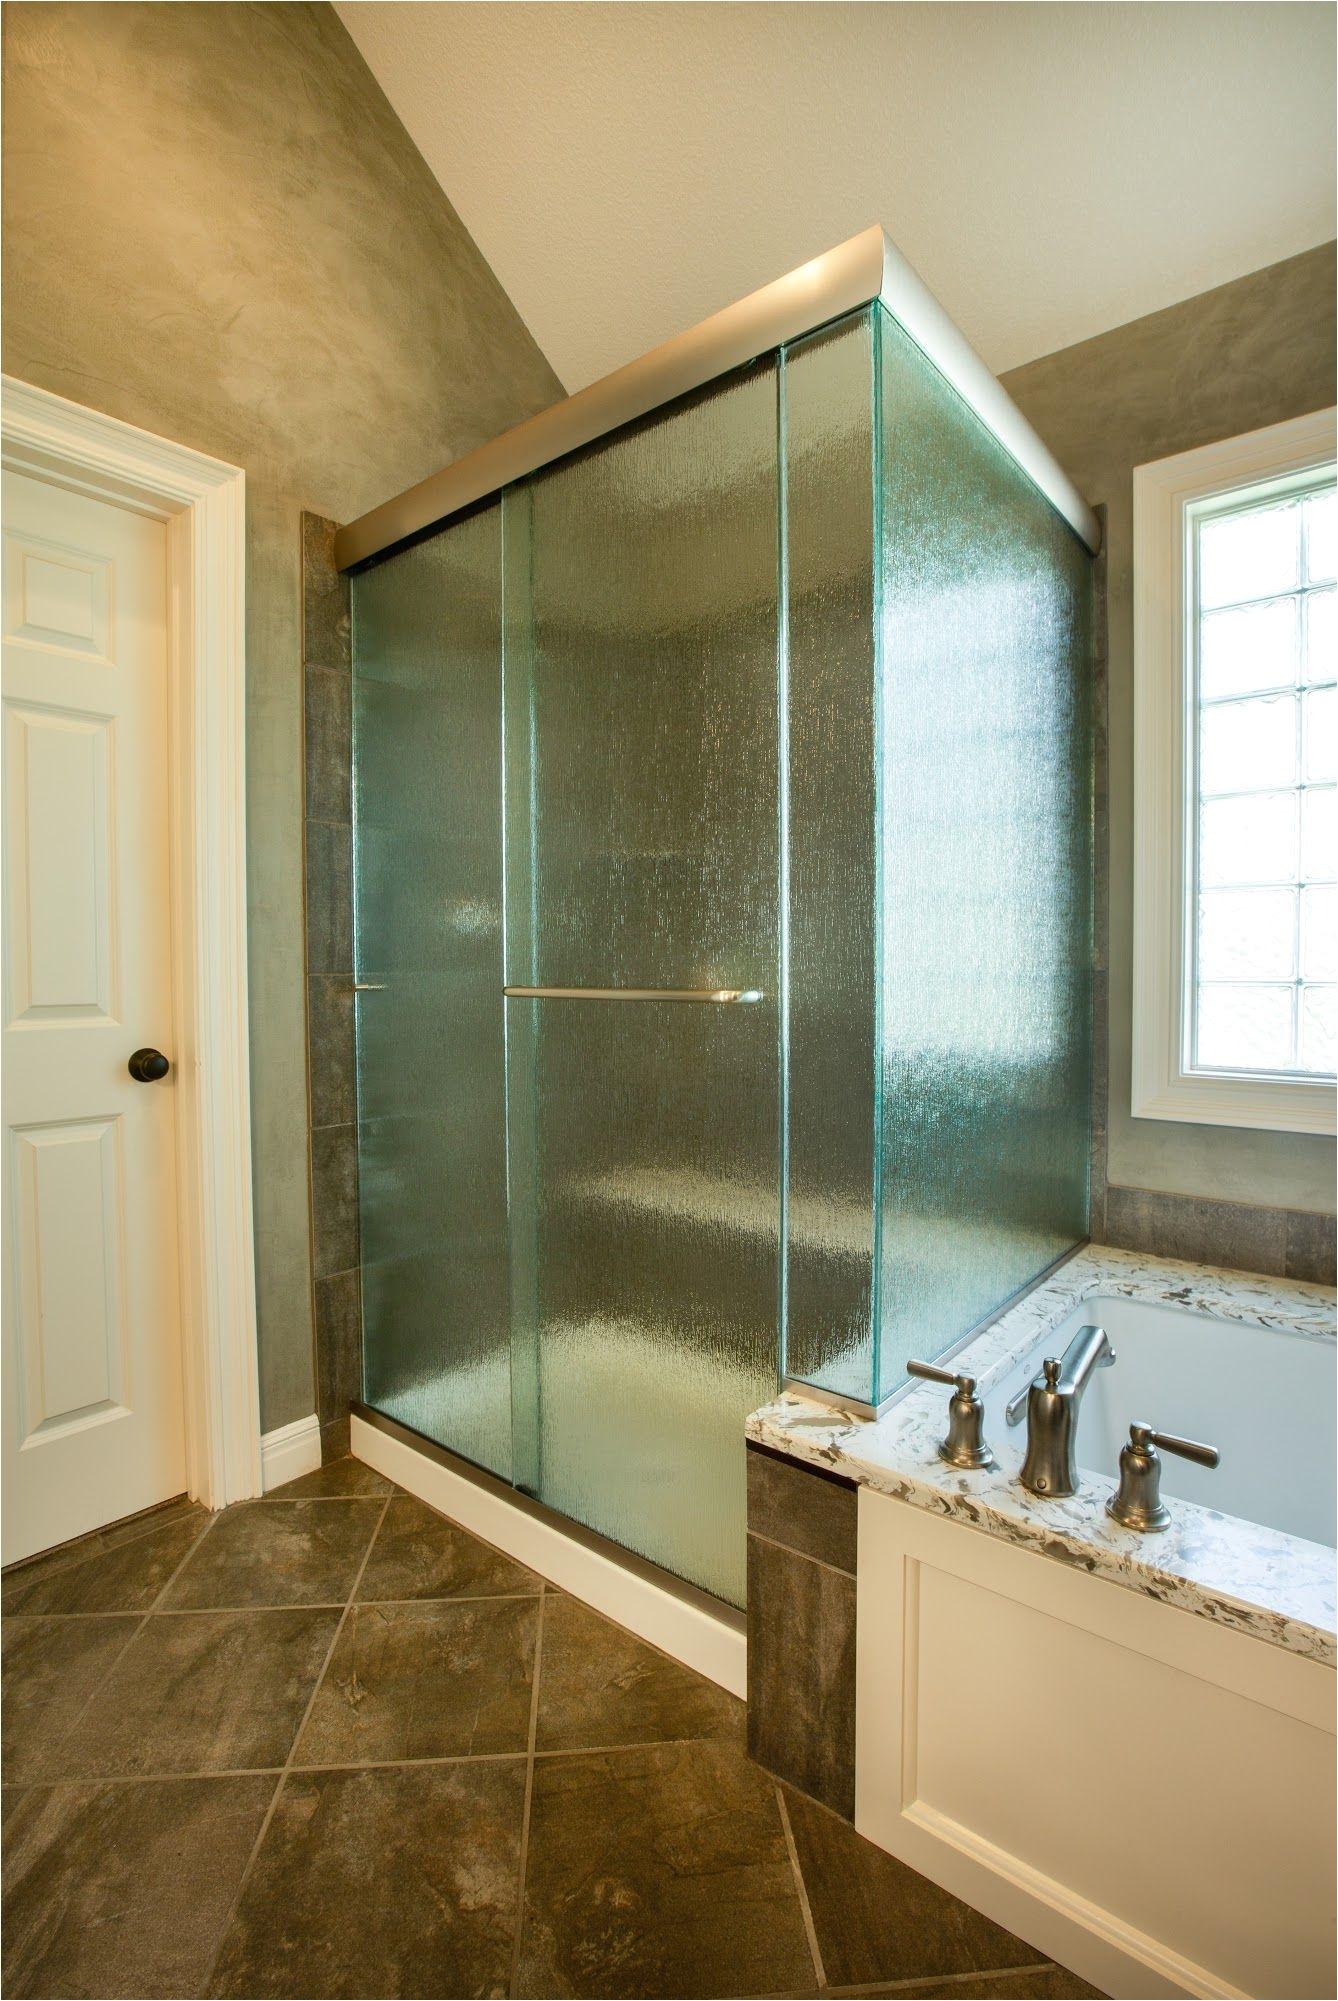 kohler underscore drop in bath white 60 x 36 21 deep 81 1 gal capacity kohler bancroft bath or deck mt high flow